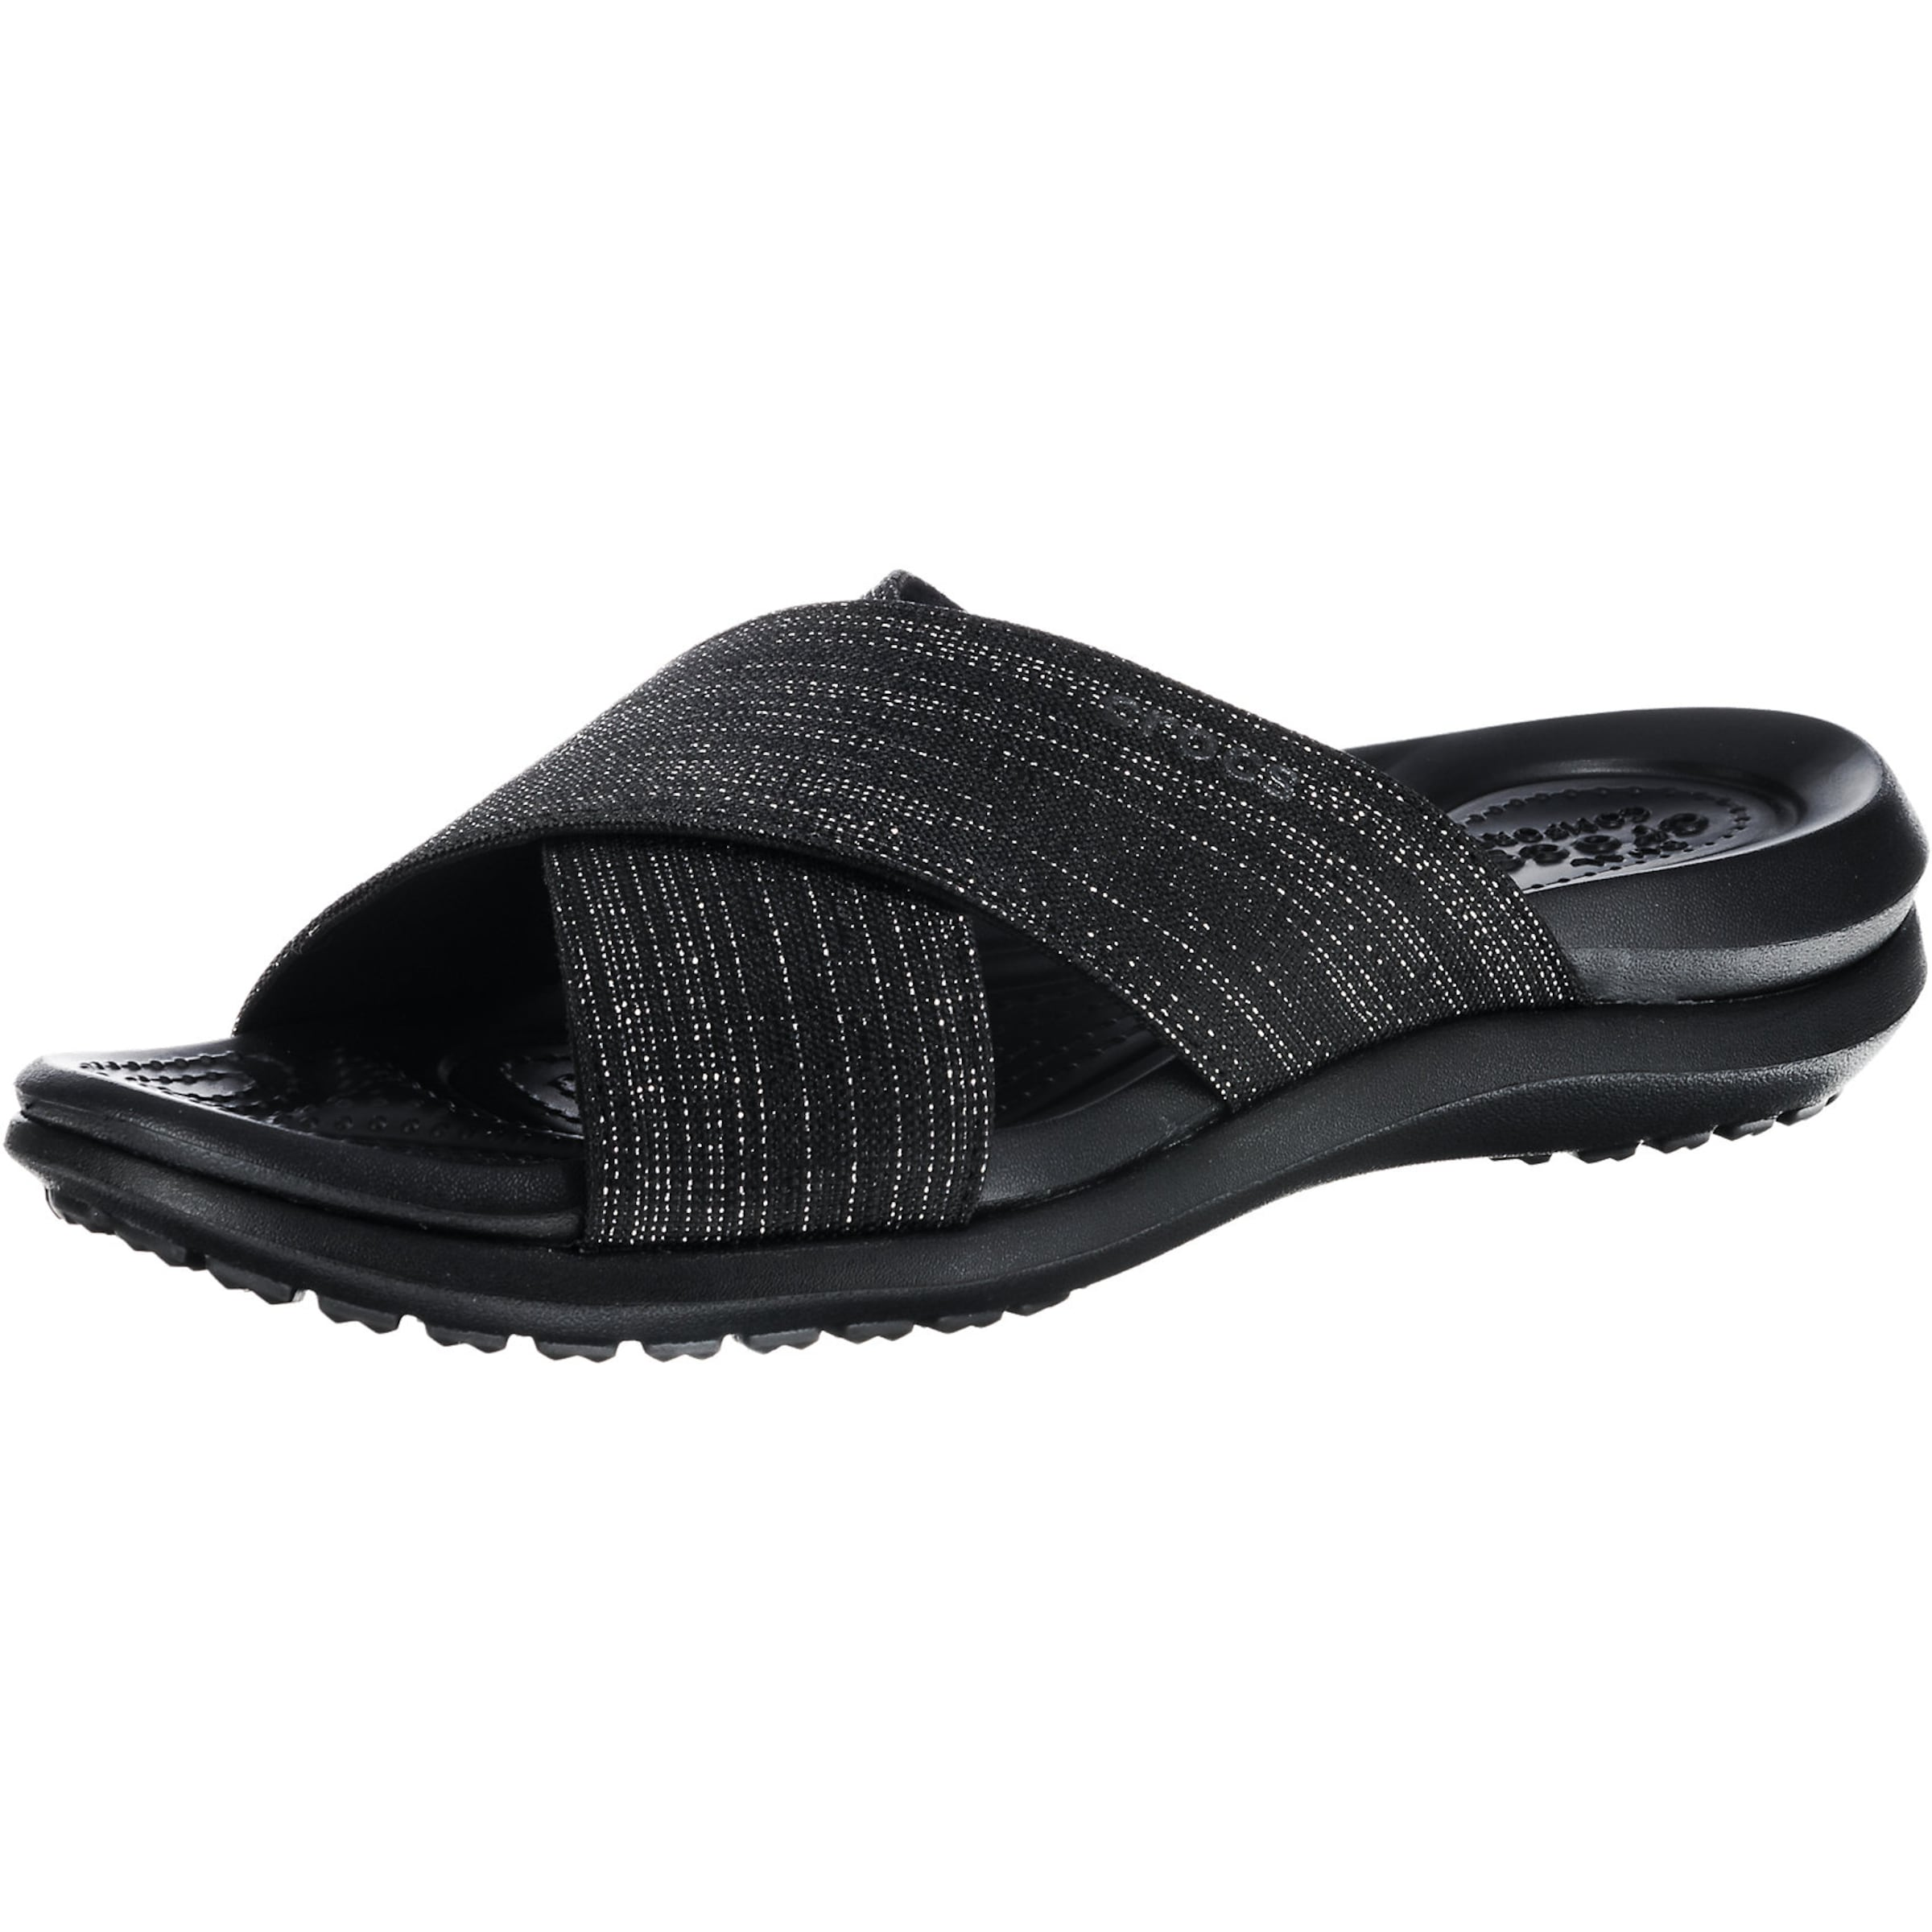 Crocs Capri Shimmer Xband Sandal W Komfort-Pantoletten Billig Beliebt Amazon Kaufen L2nGFtx